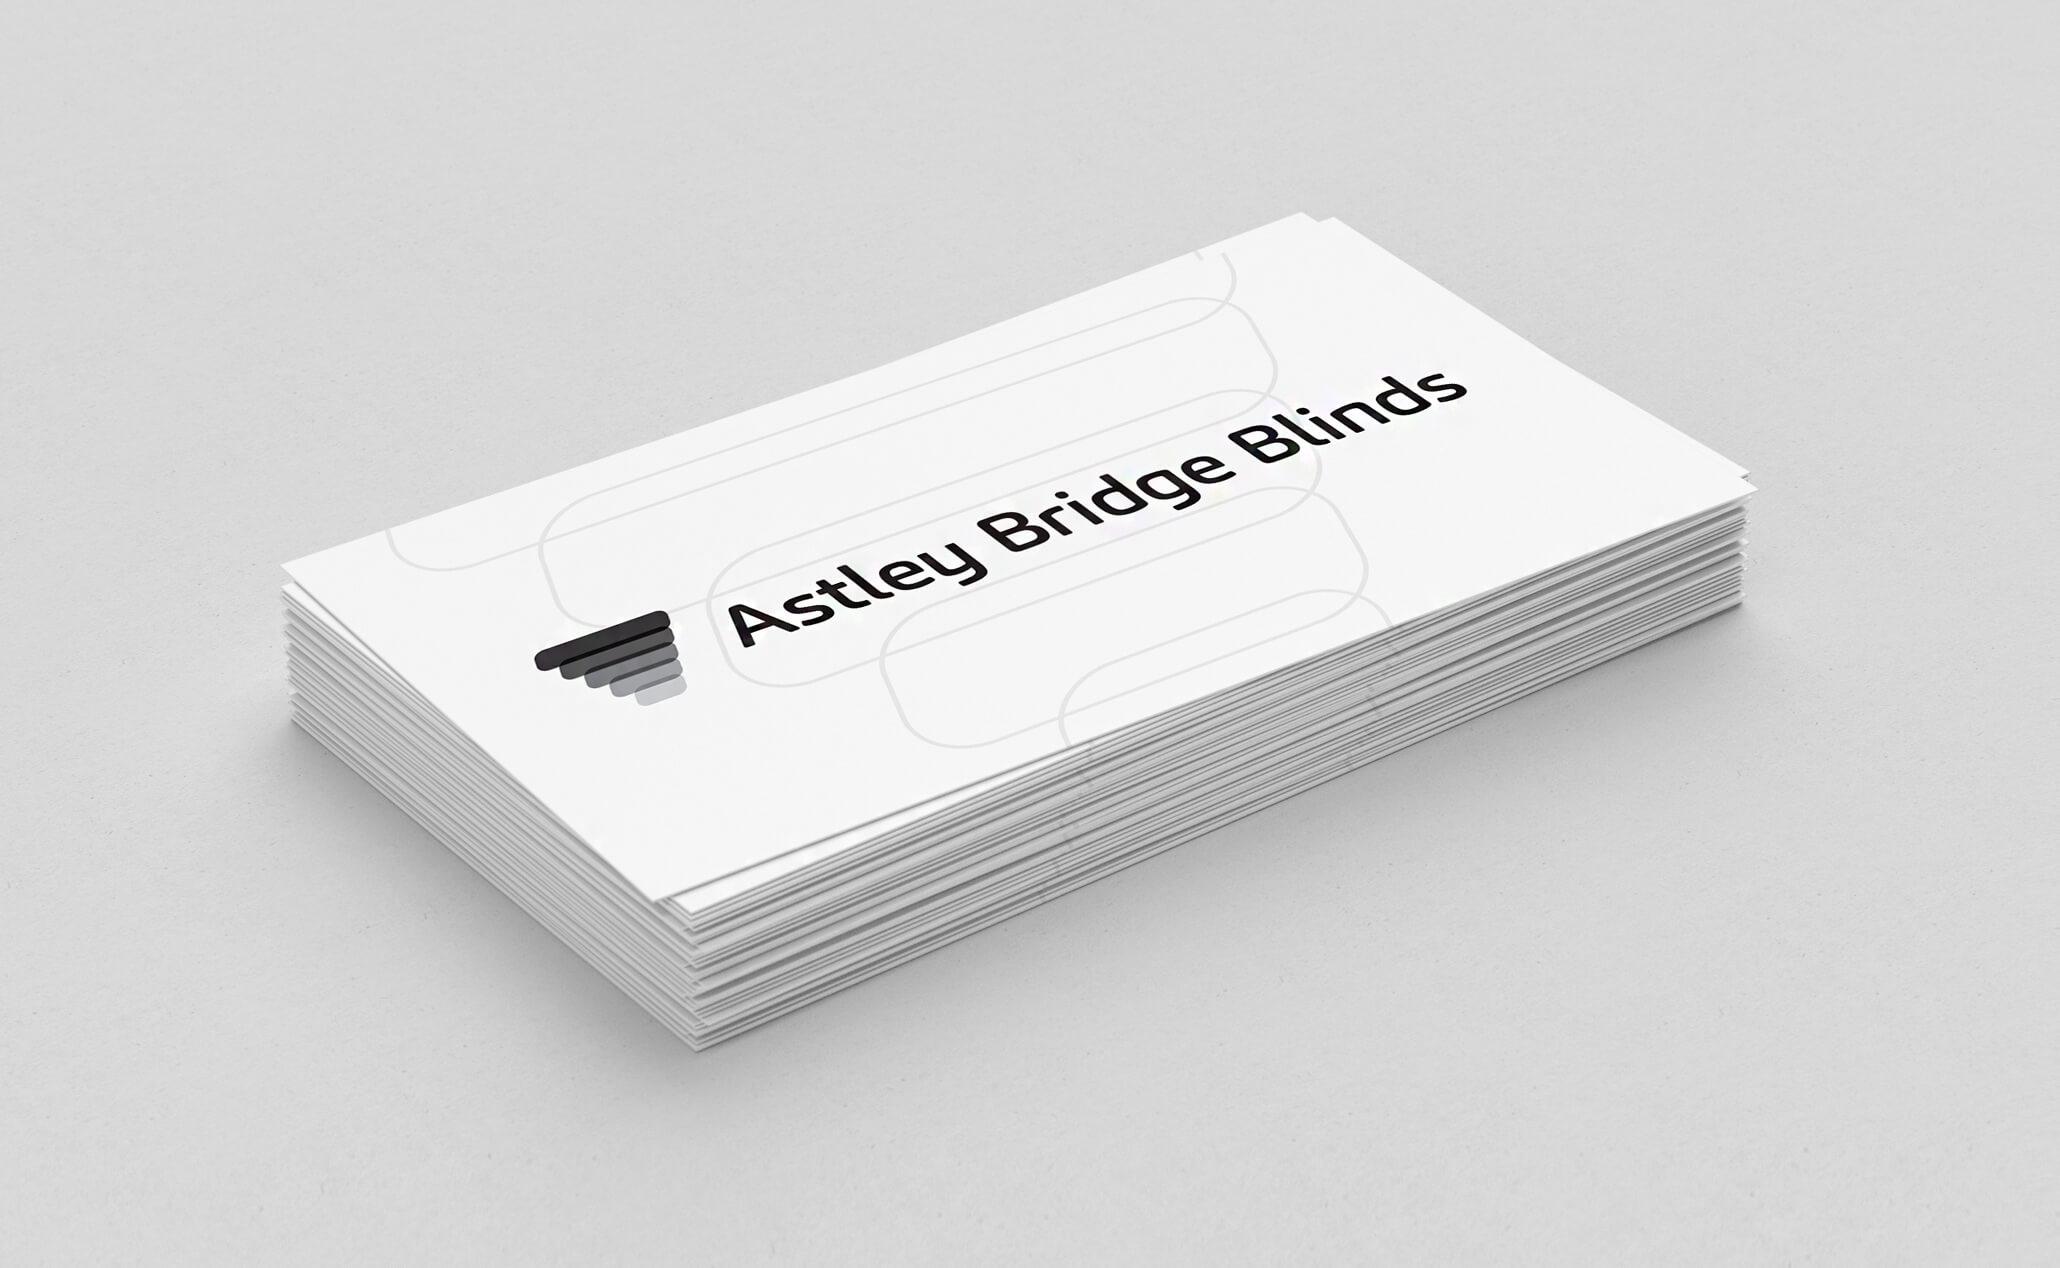 Astley Bridge Blinds business cards